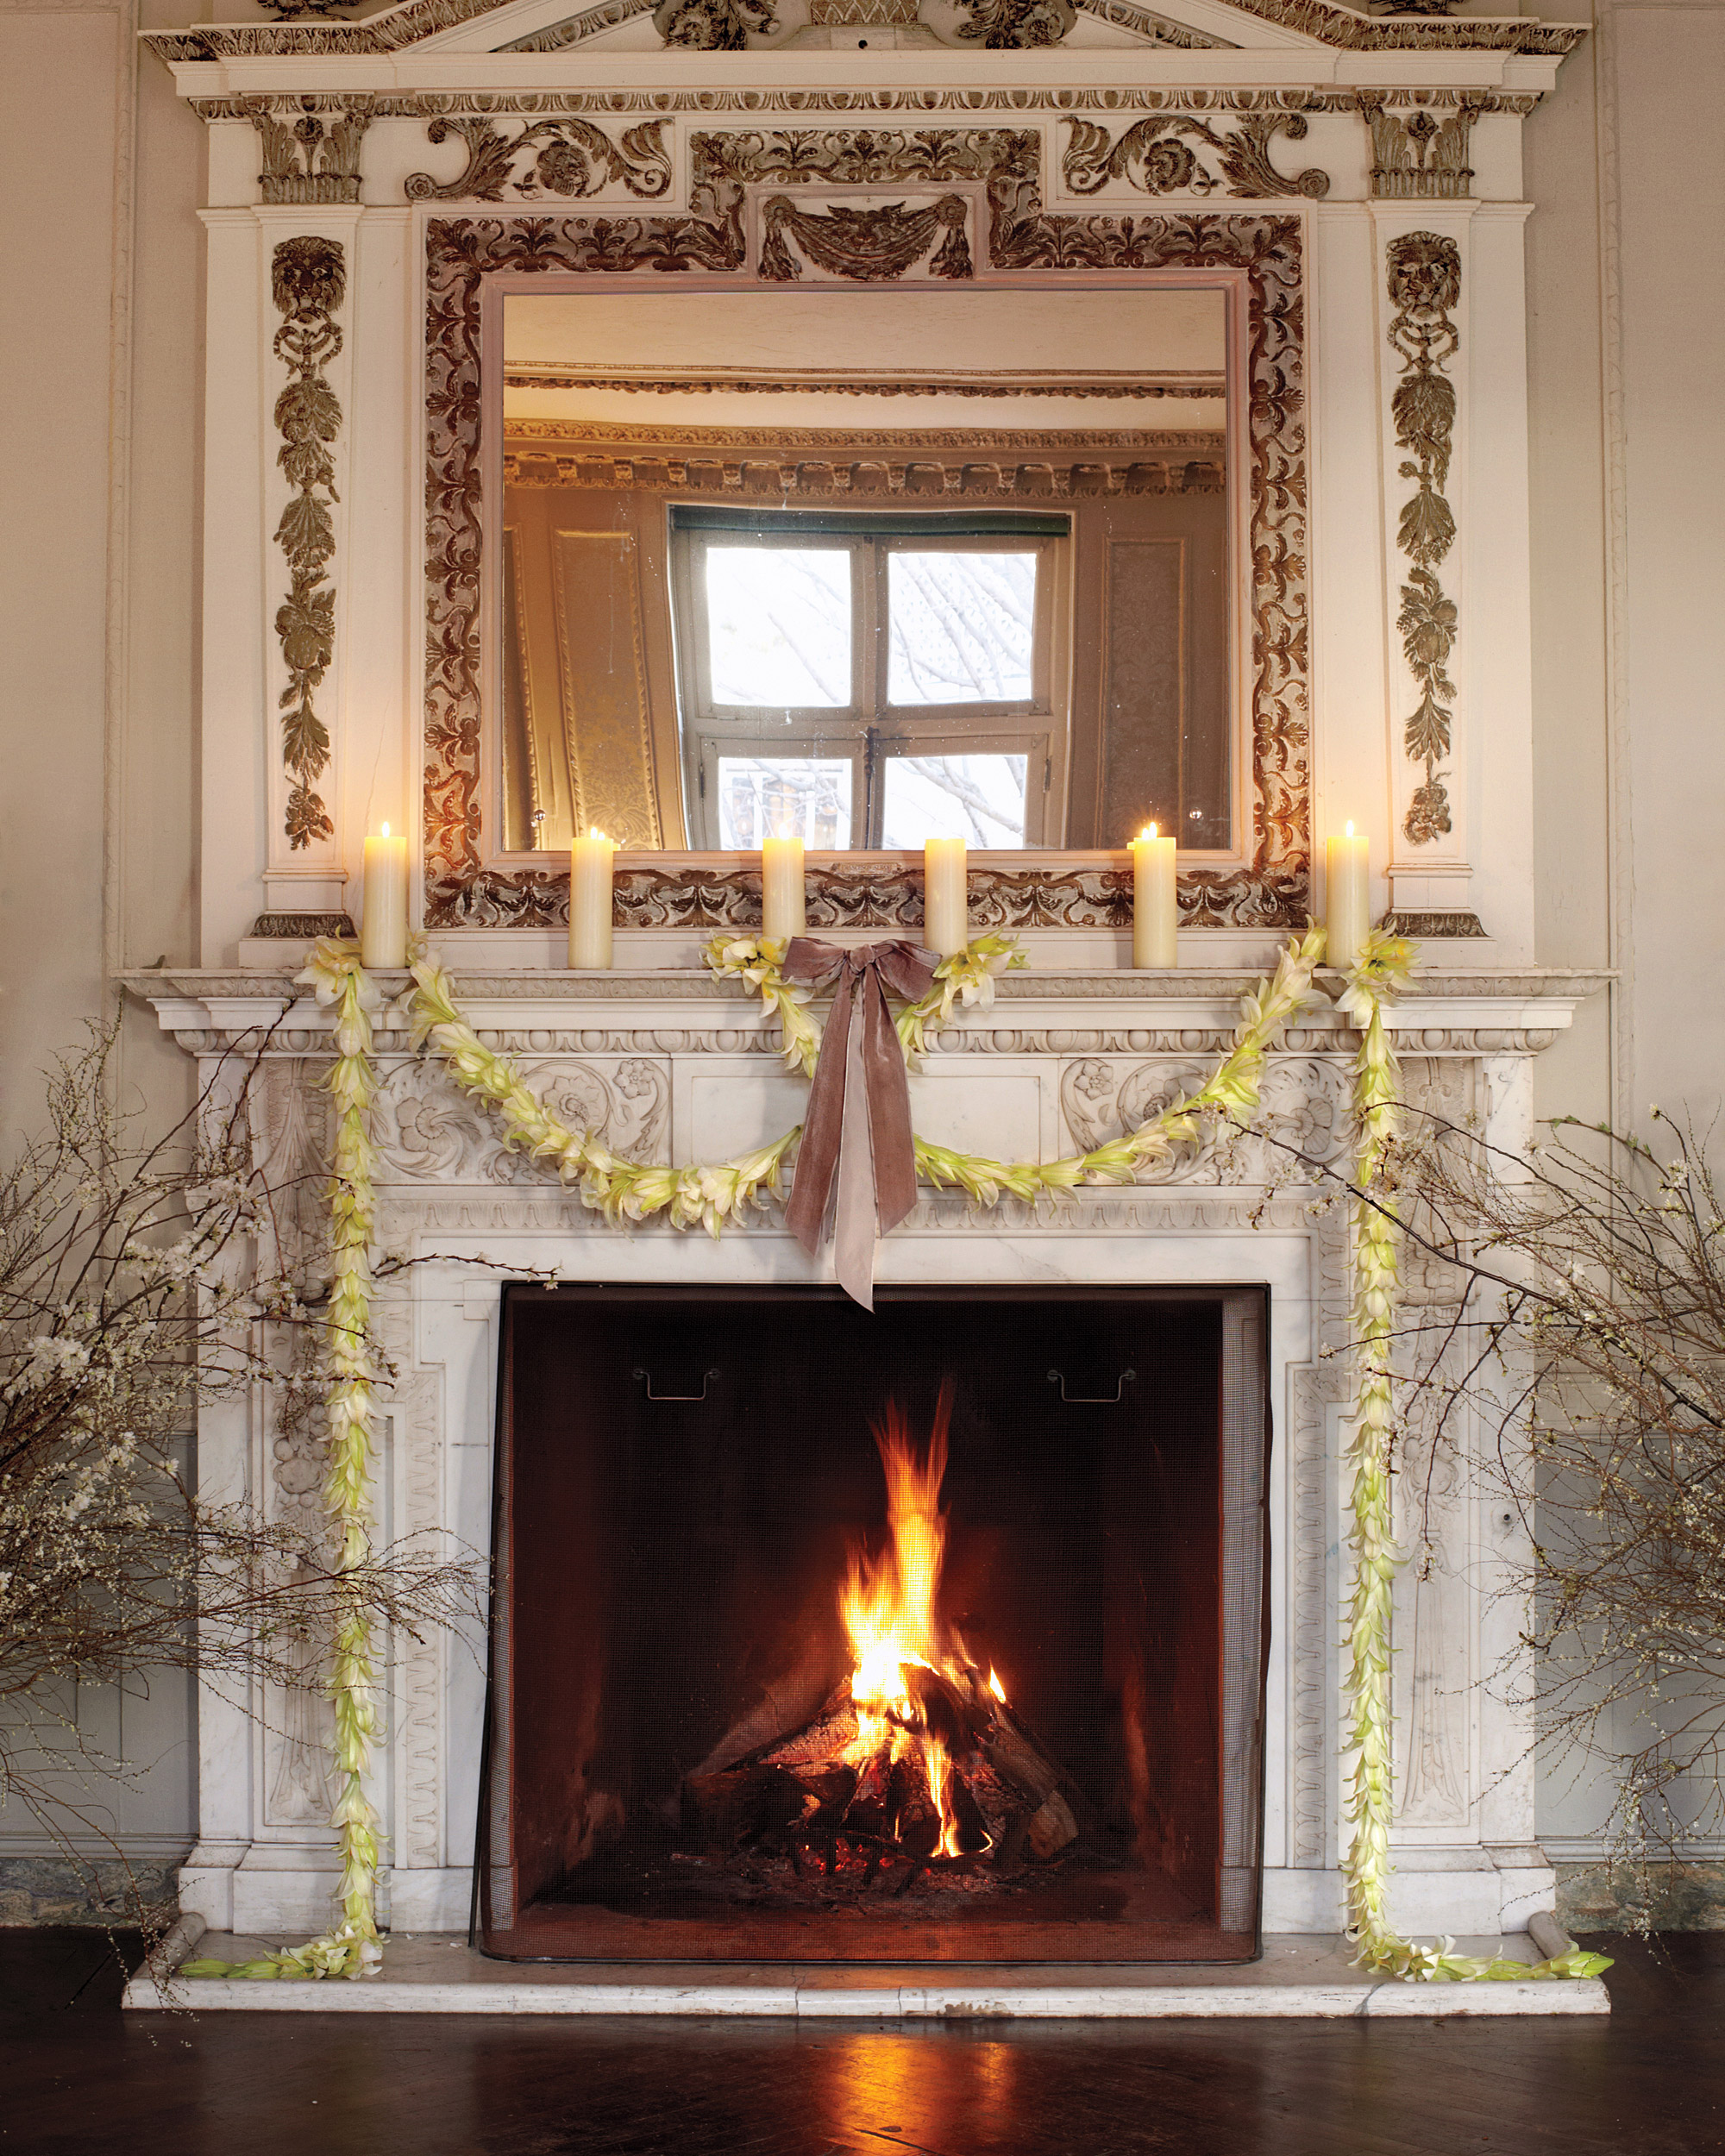 fireplace-0811mwd107282.jpg